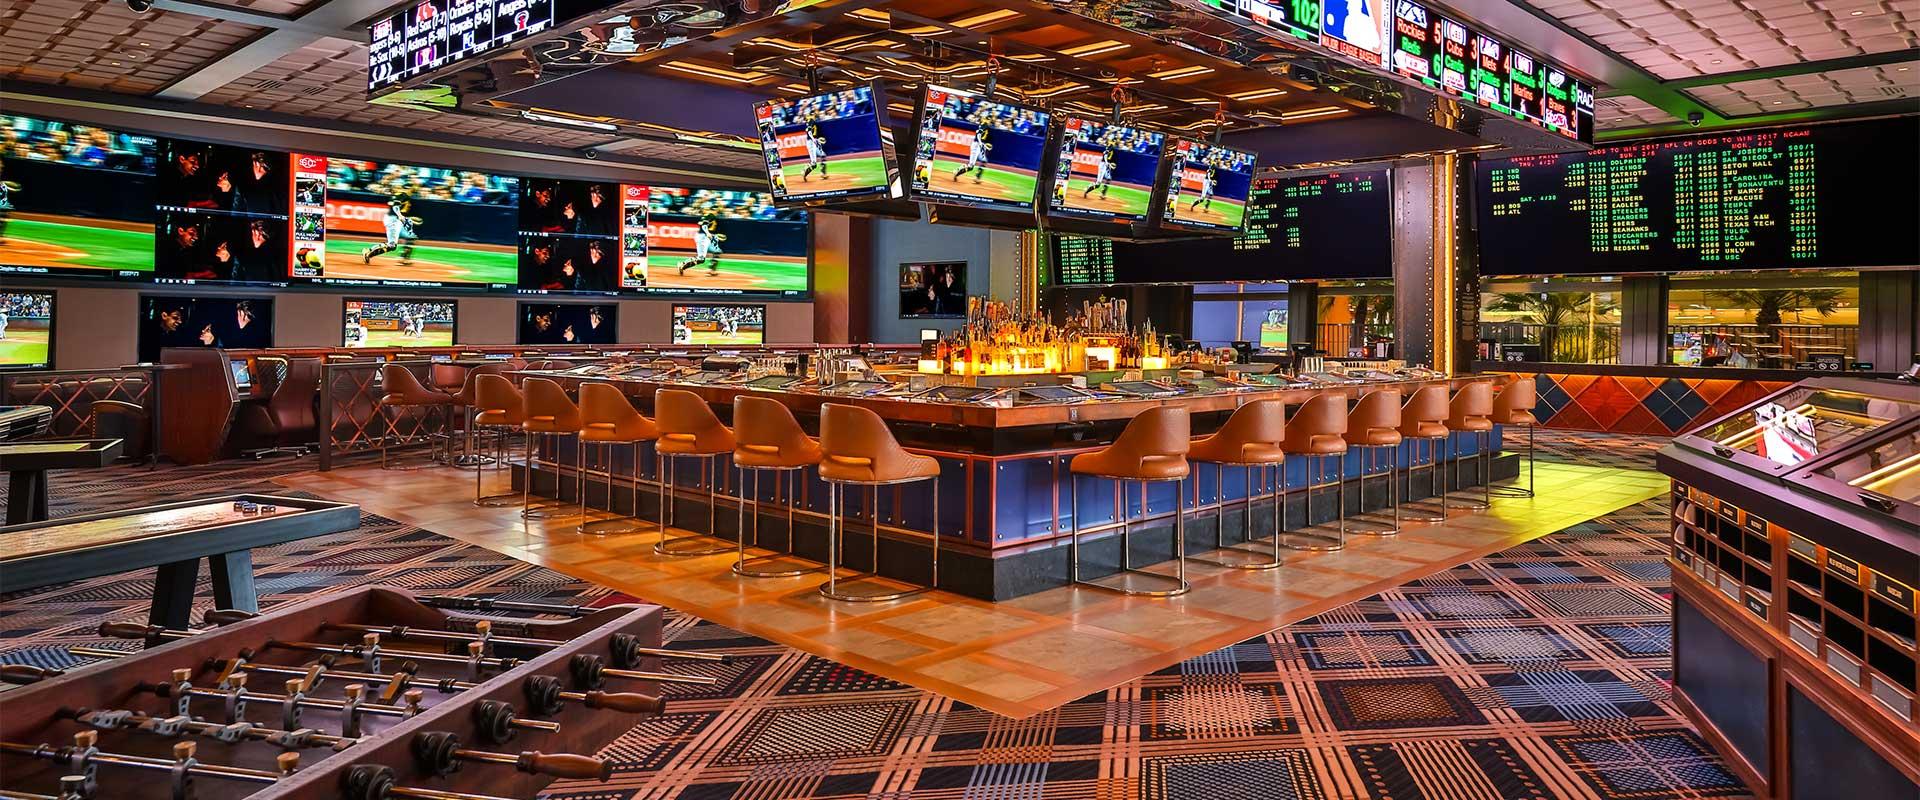 Benefits of using an online casino